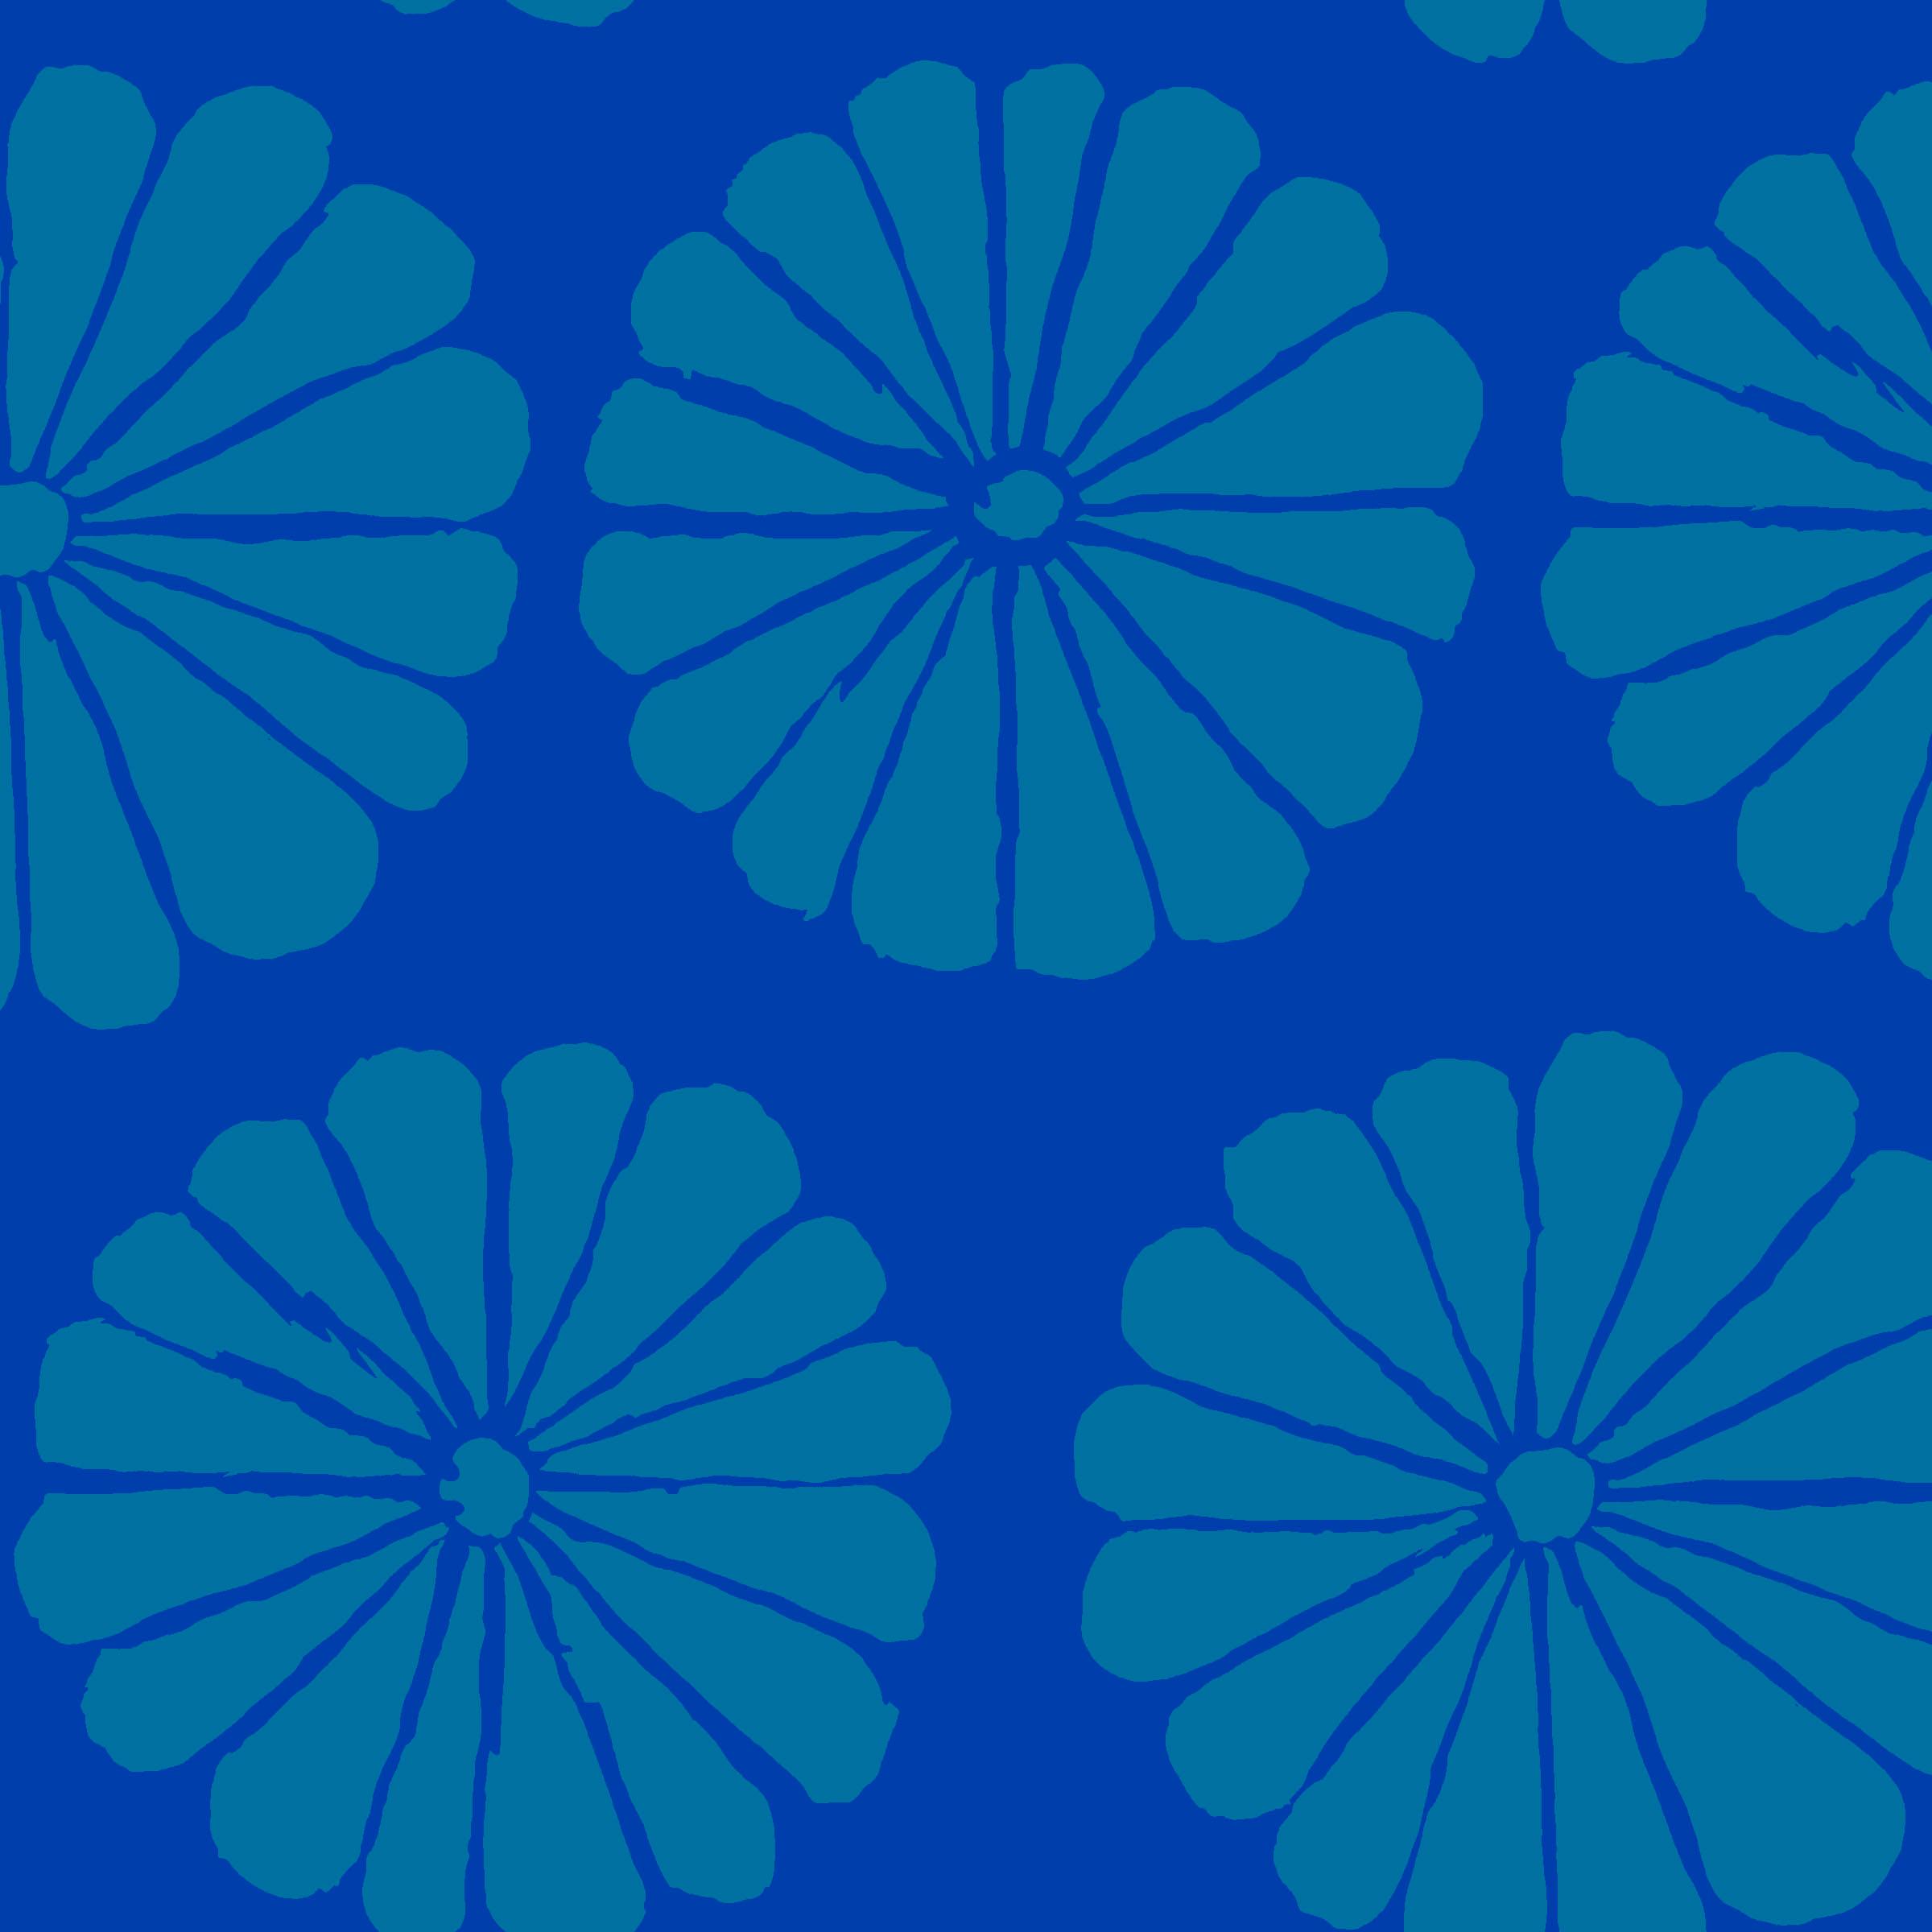 Damask Flower - PWGP183 - Blue